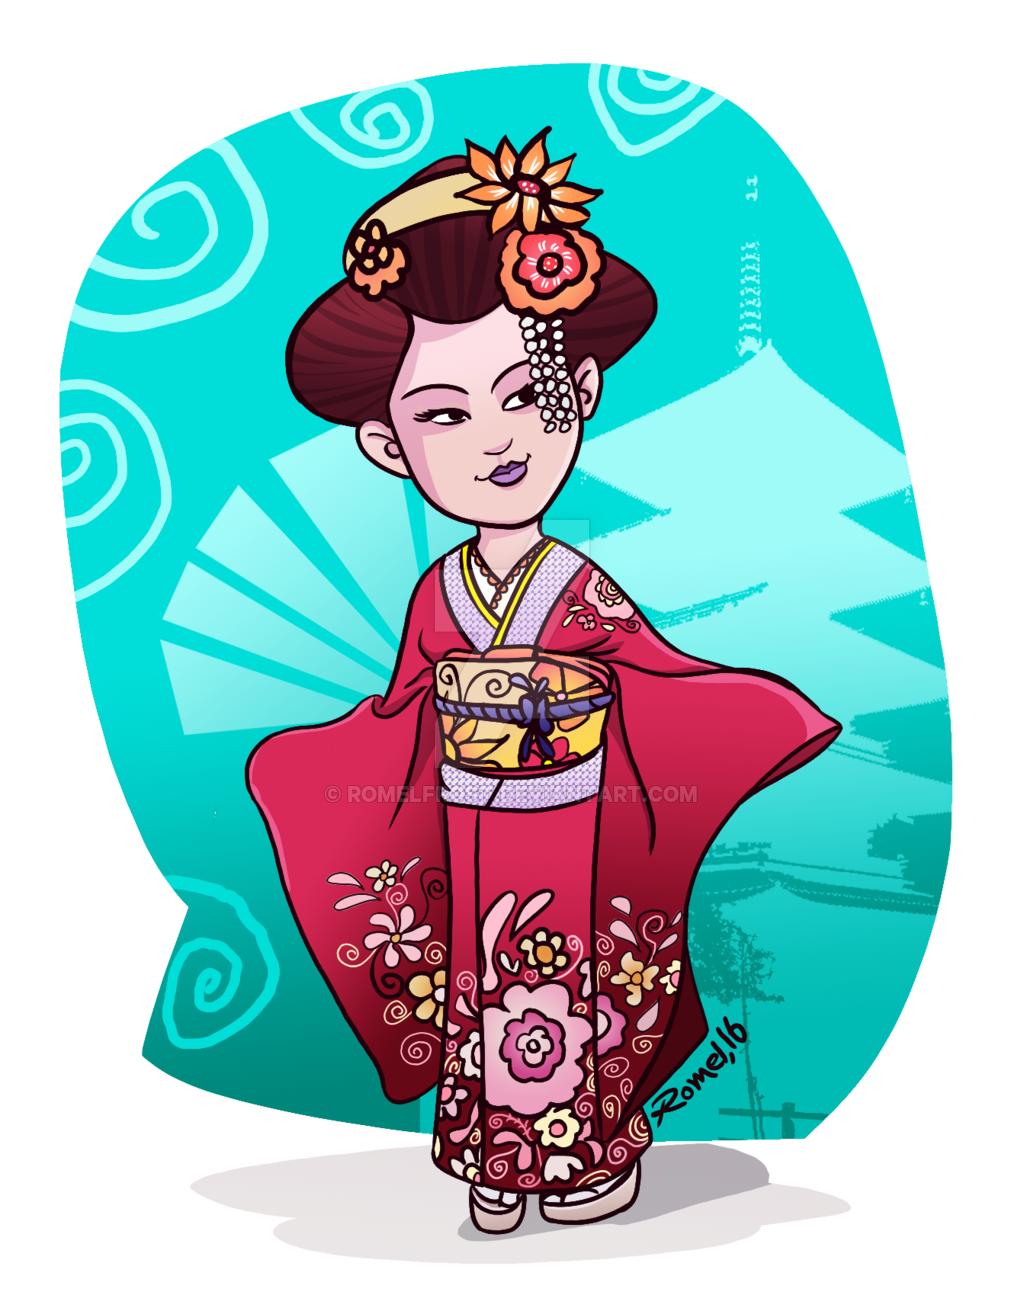 Kimono girl 62 by Nunnallyrey on DeviantArt